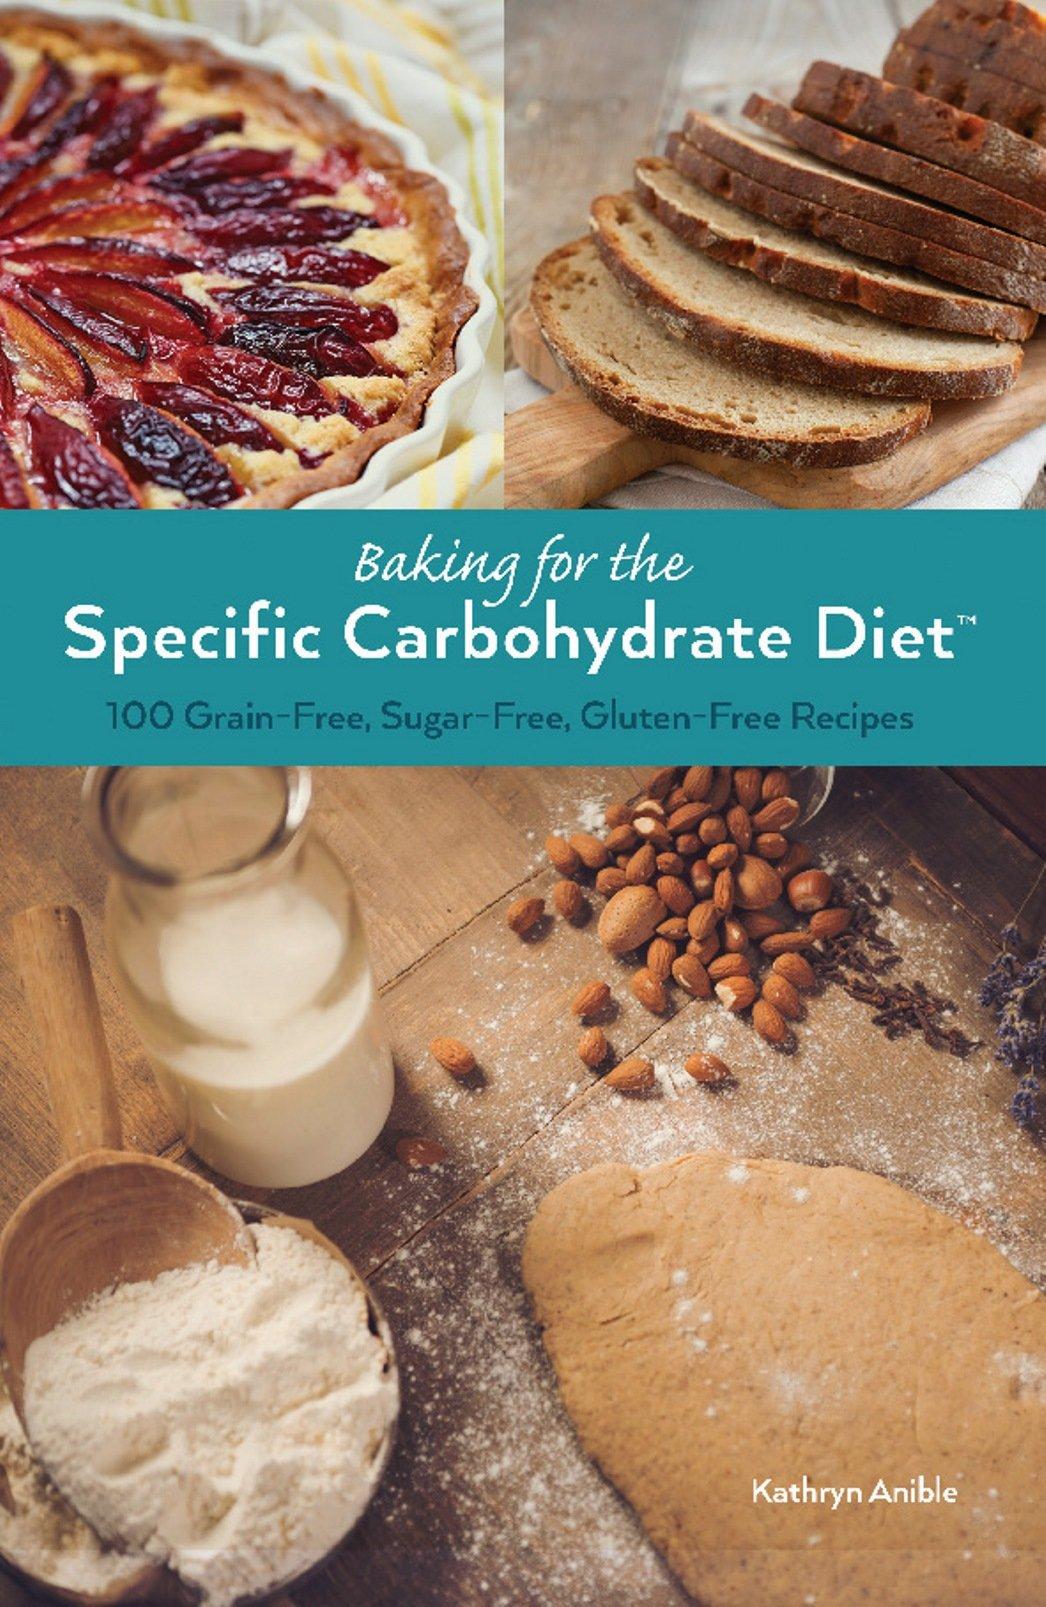 Baking Specific Carbohydrate Diet Gluten Free